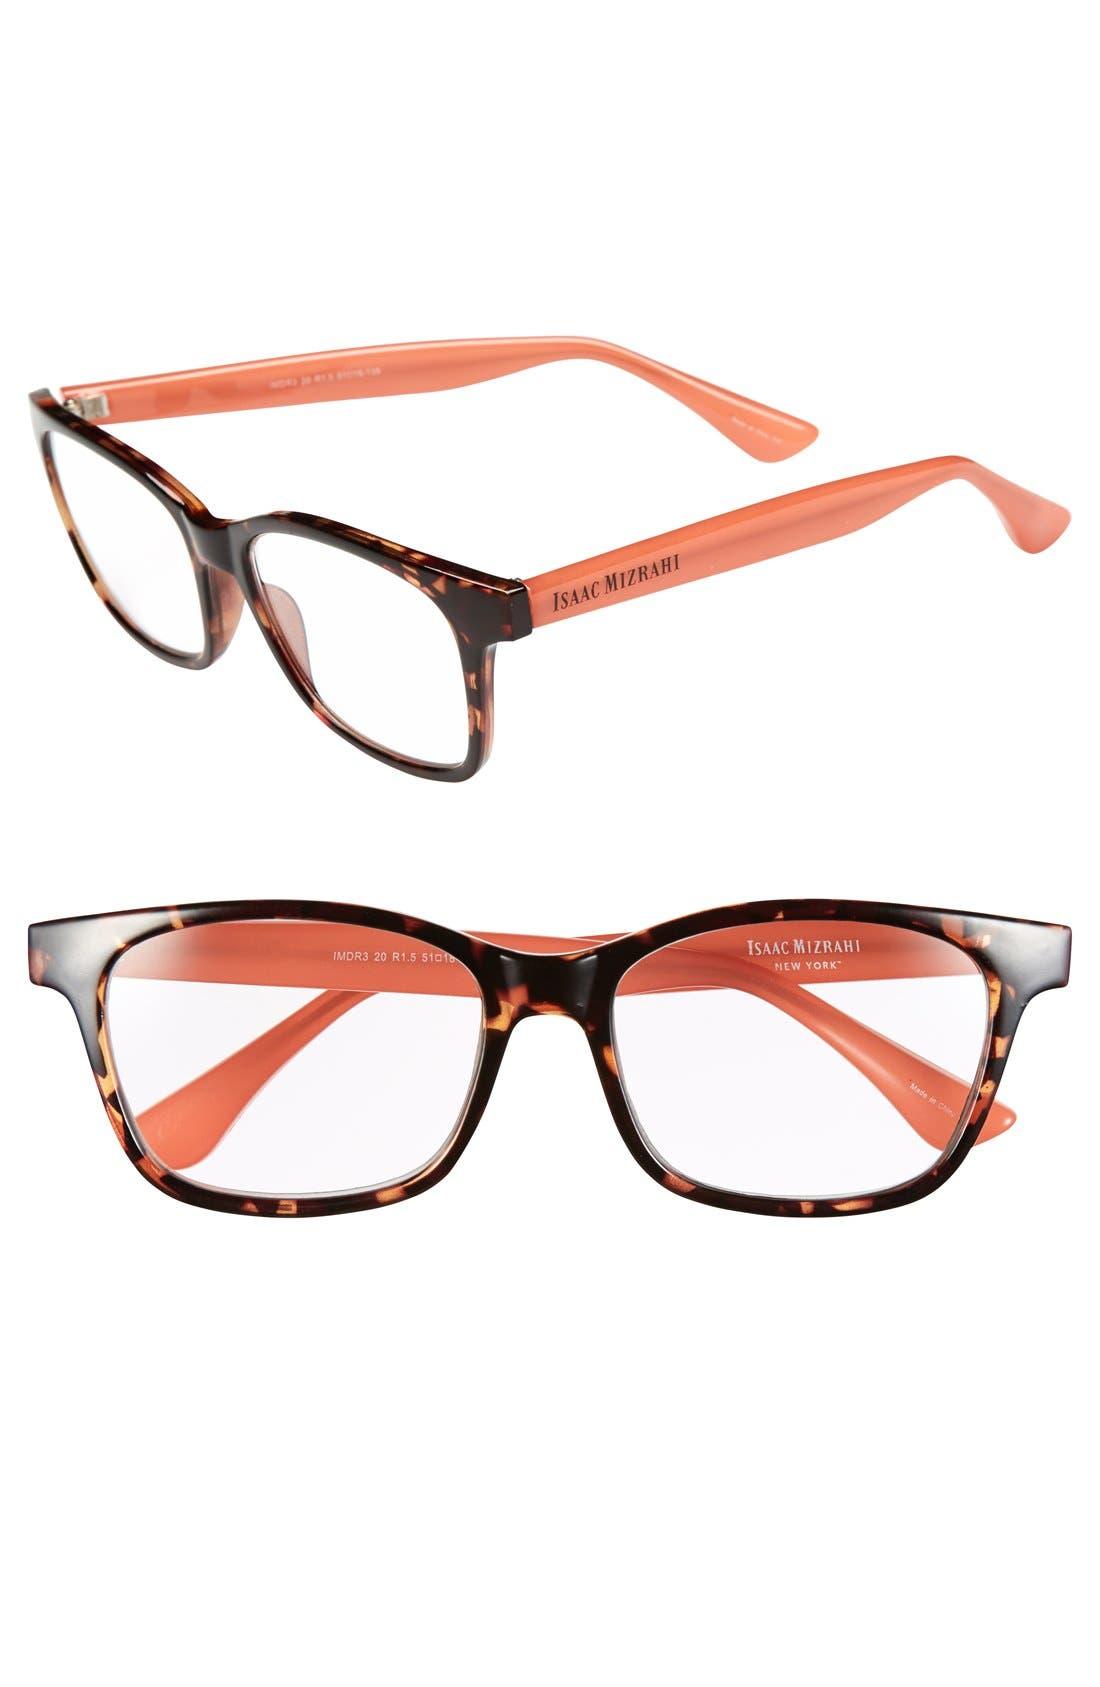 Main Image - Isaac Mizrahi New York 51mm Square Reading Glasses